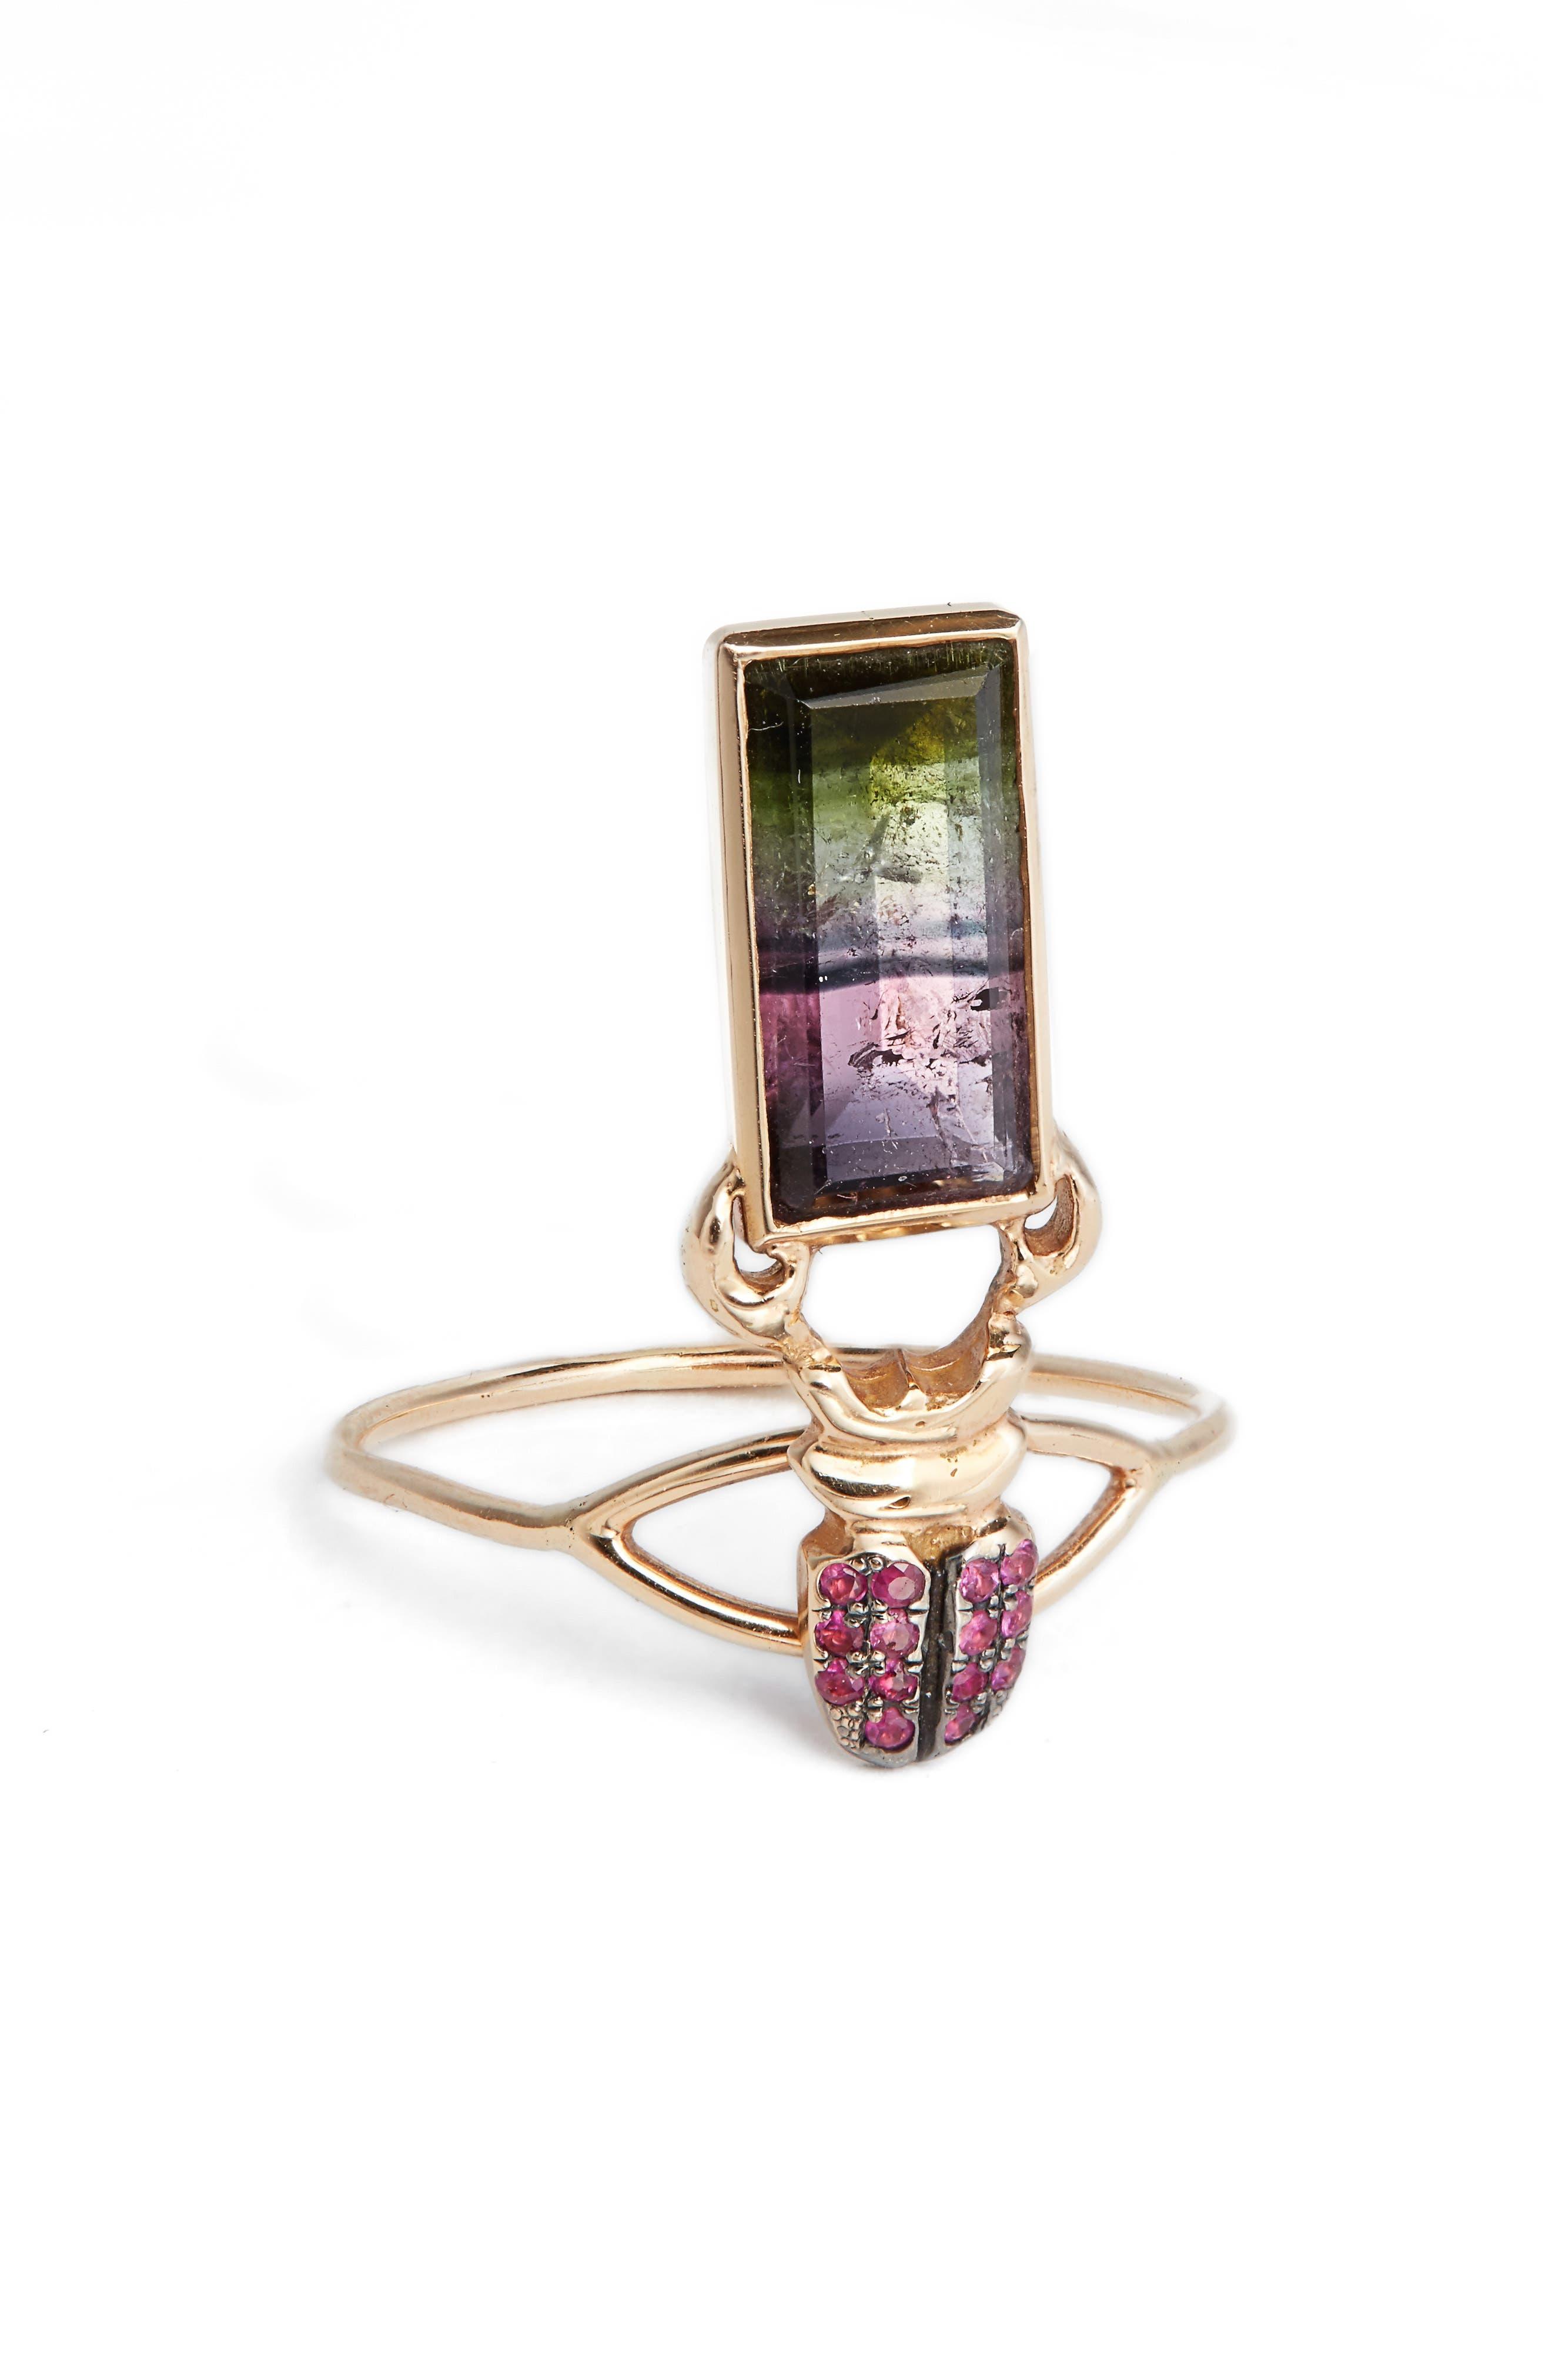 DANIELA VILLEGAS Khepri Ruby & Watermelon Tourmaline Ring